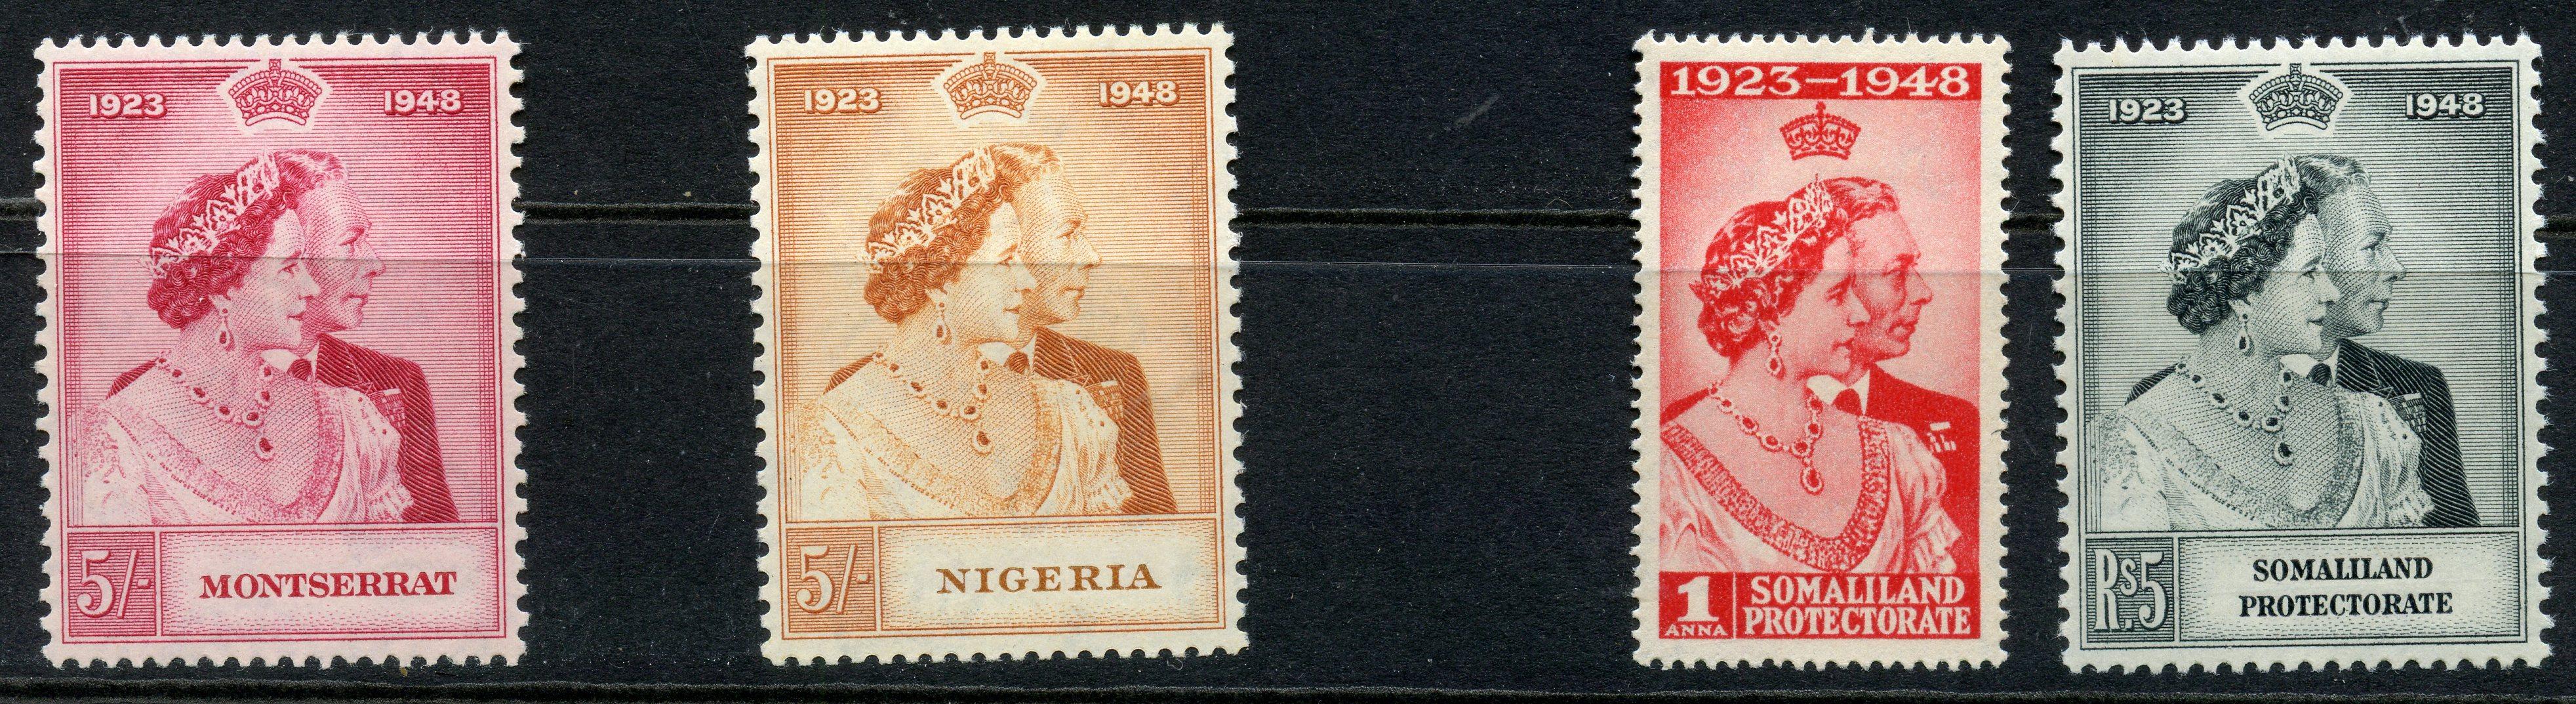 OMNIBUS 1948 Silver Wedding top values from Montserrat, Nigeria plus Somaliland set. Cat £32.